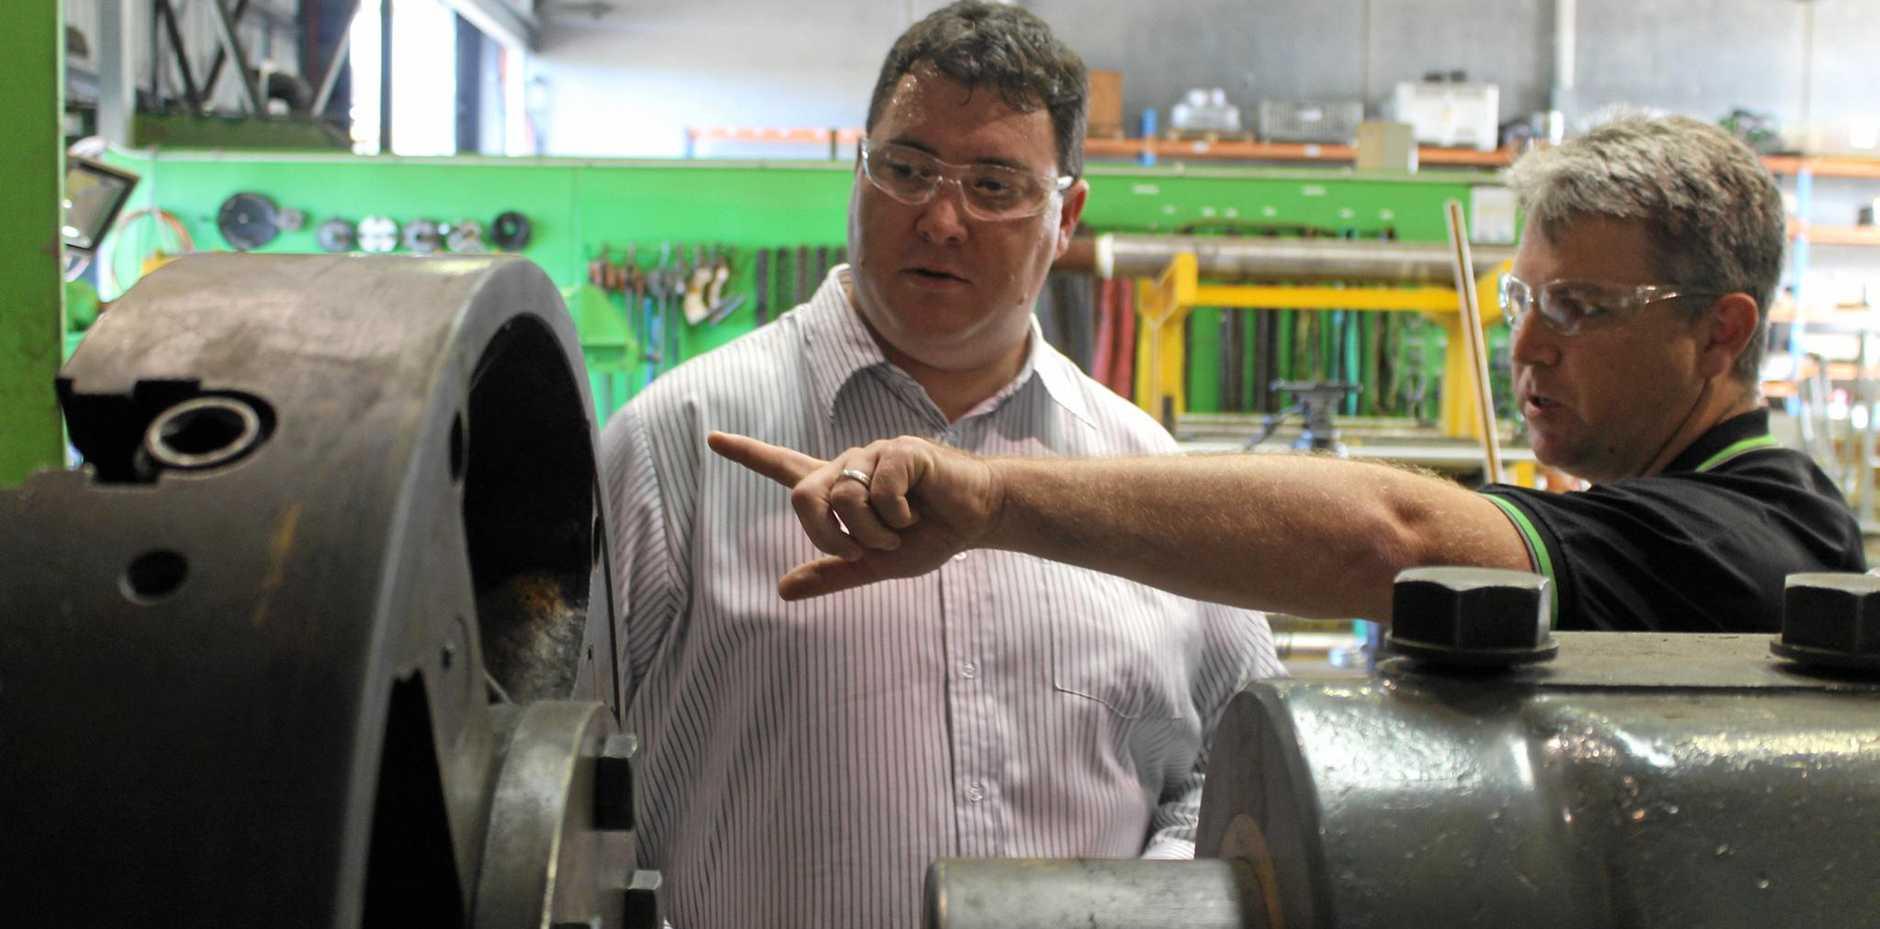 Dawson MP George Christensen tours Mackay Conveyor Equipment's Paget workshop with managing director Jason Kelly.